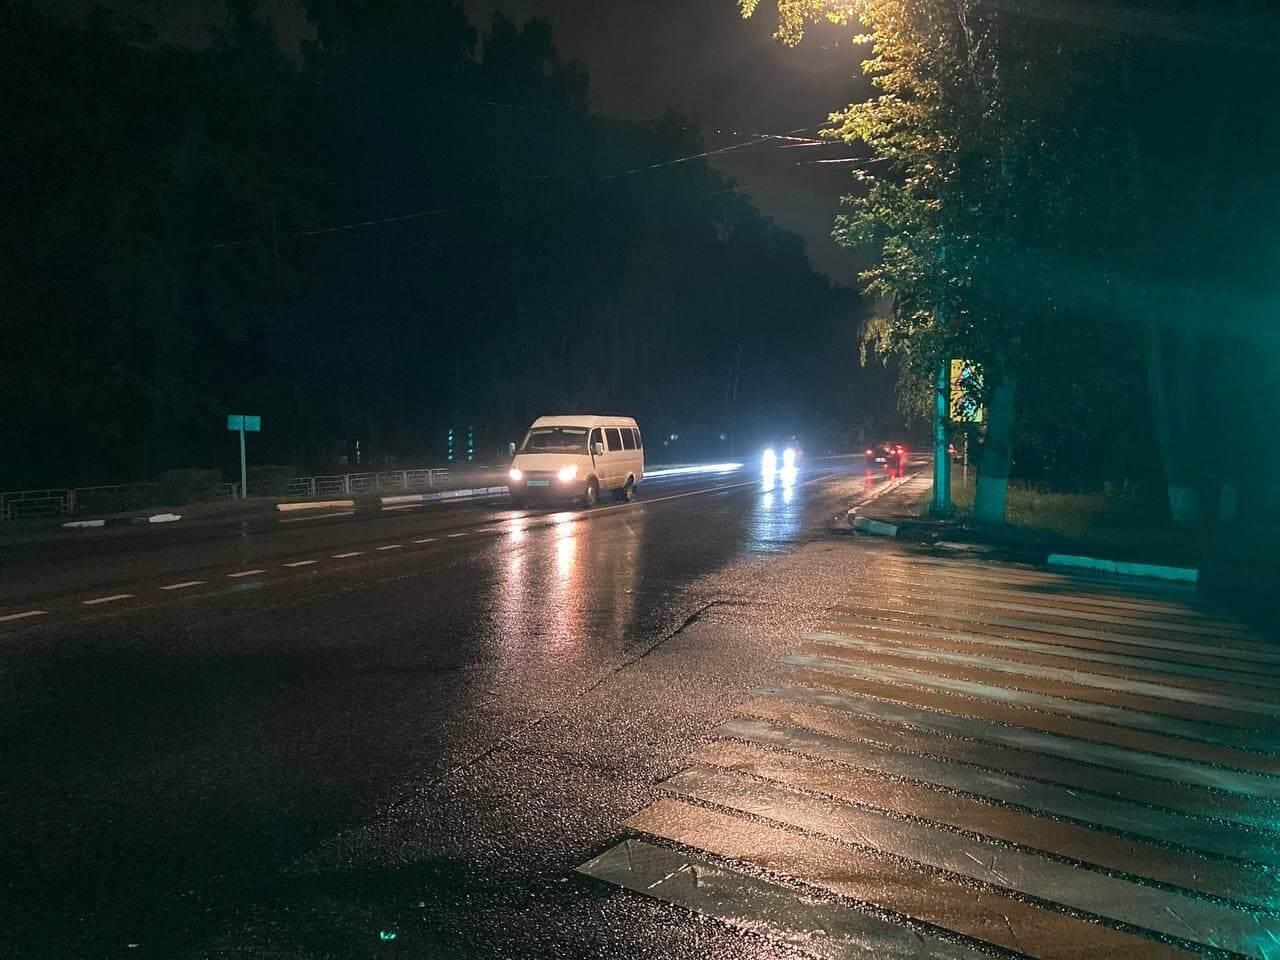 night-city-photo